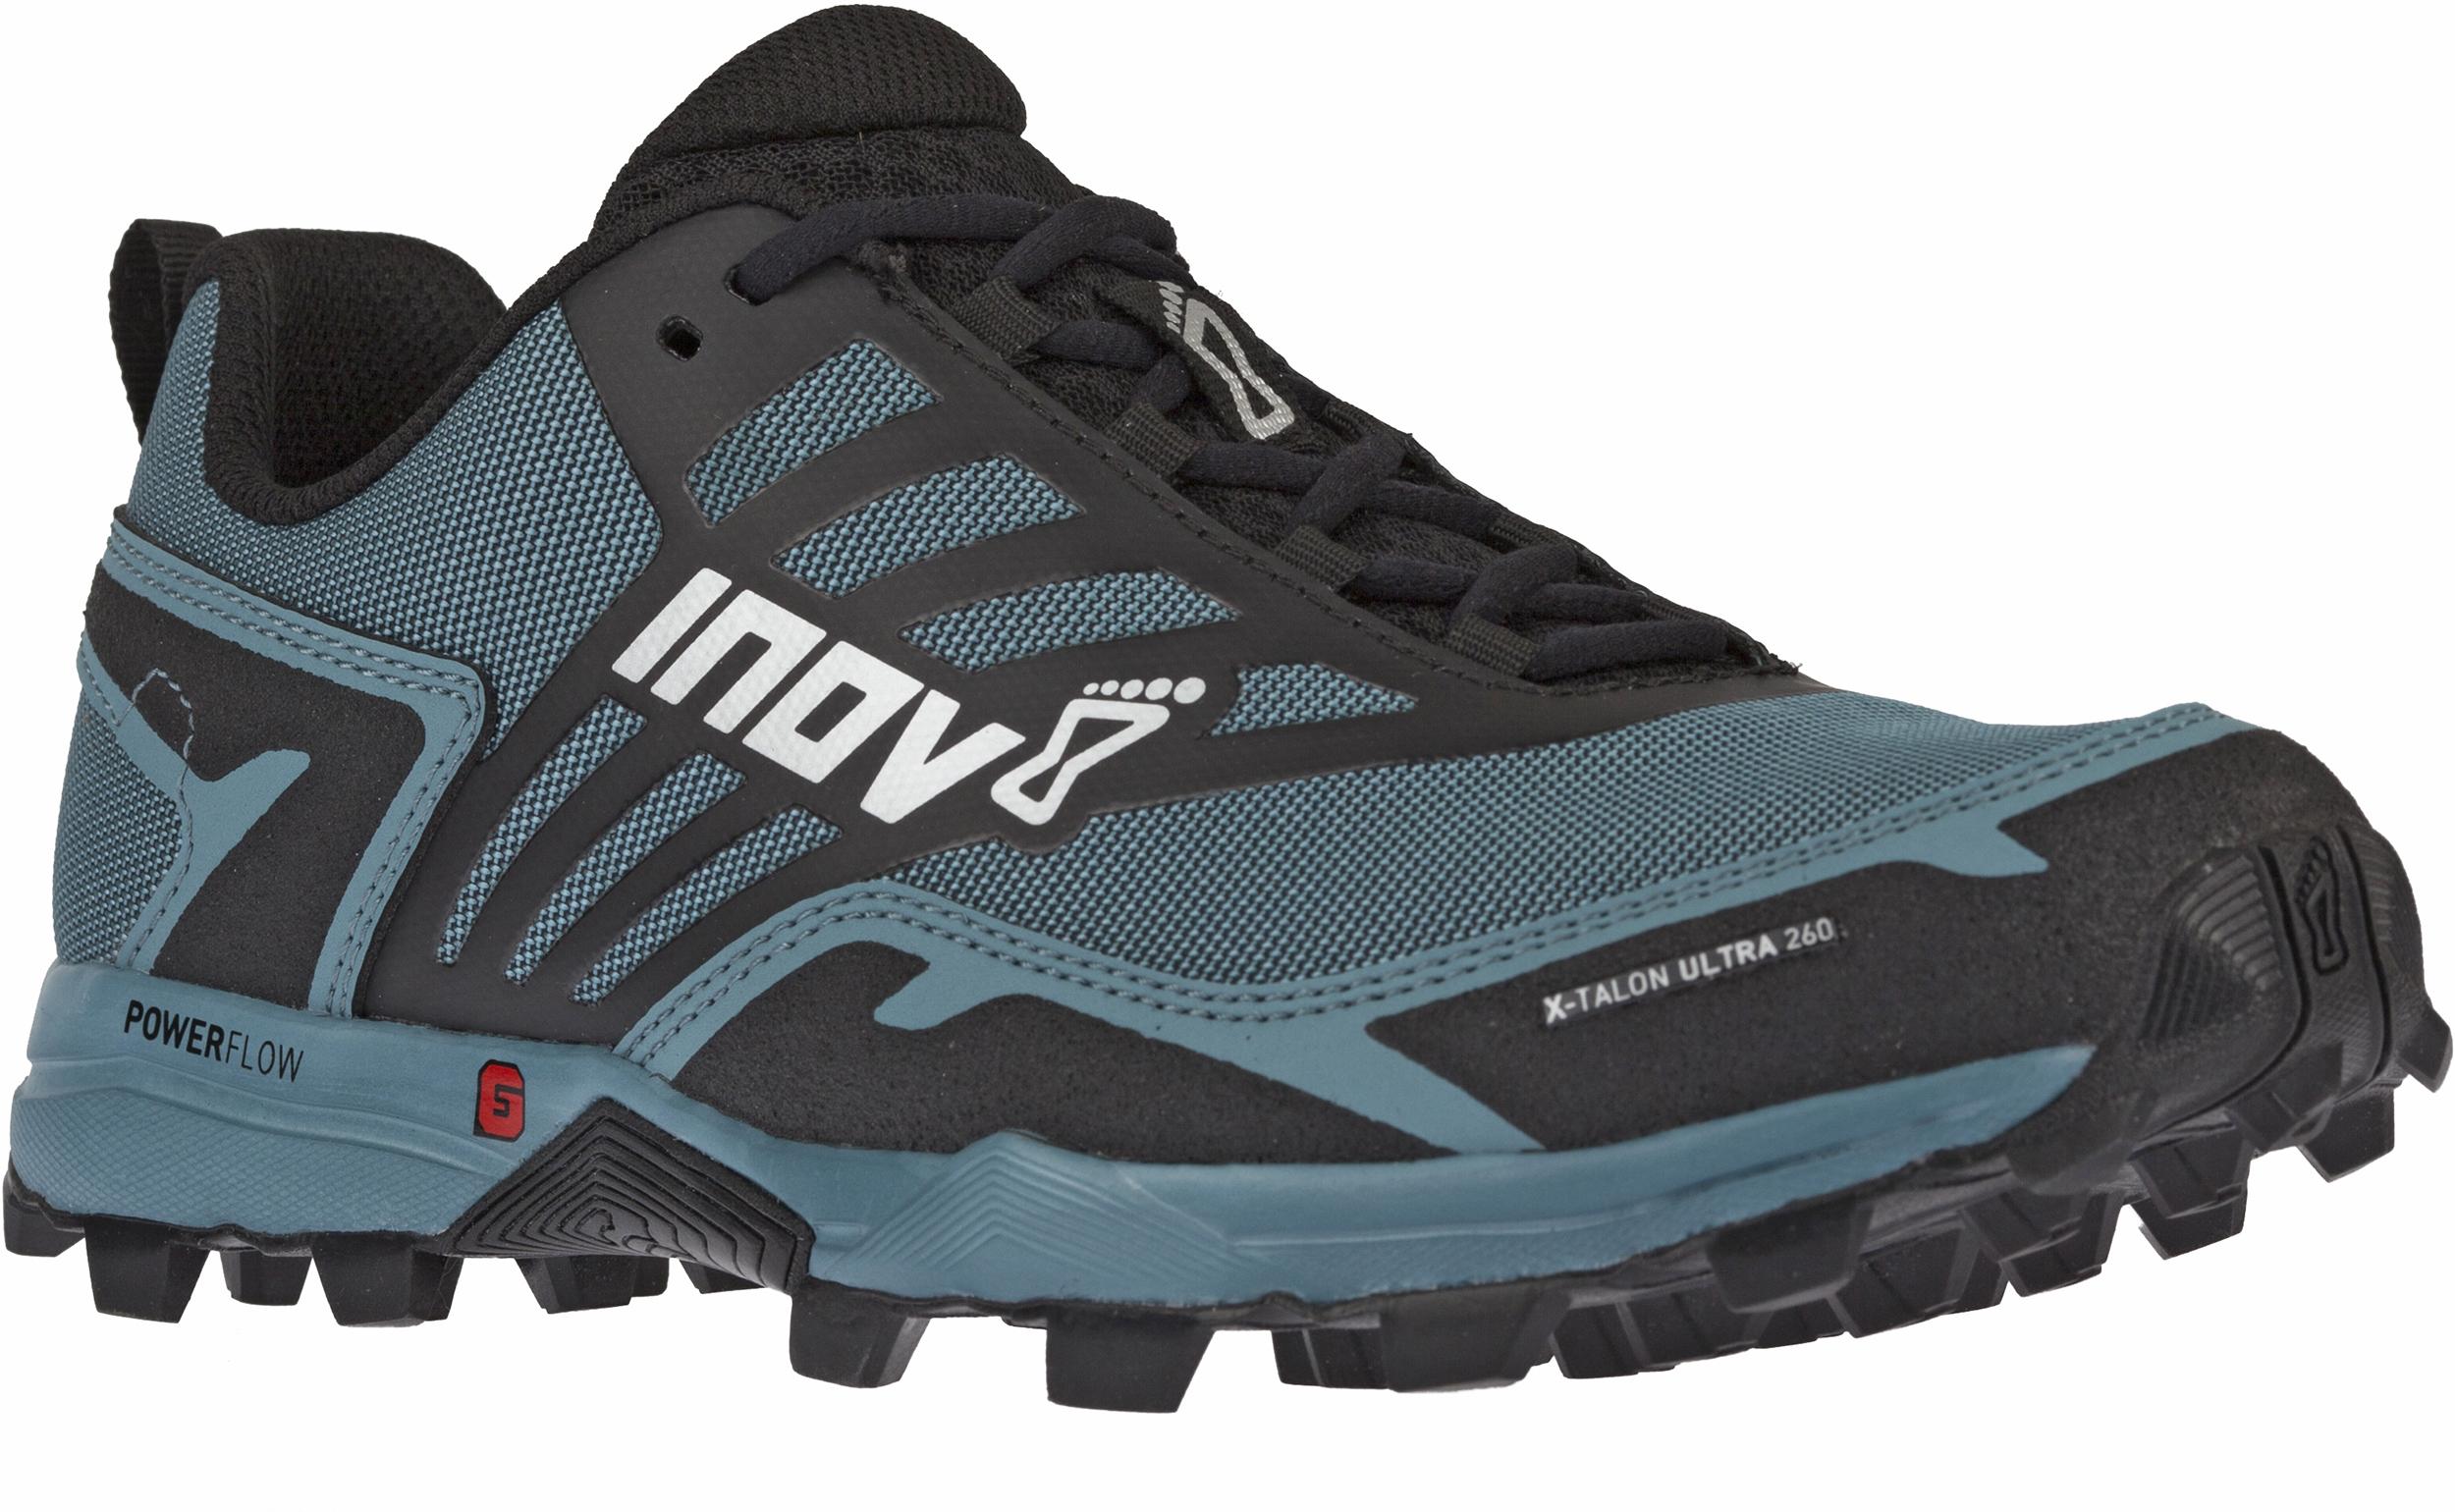 huge discount 6d91a 10b2a Inov-8 X-Talon Ultra 260 Trail Running Shoes - Women's